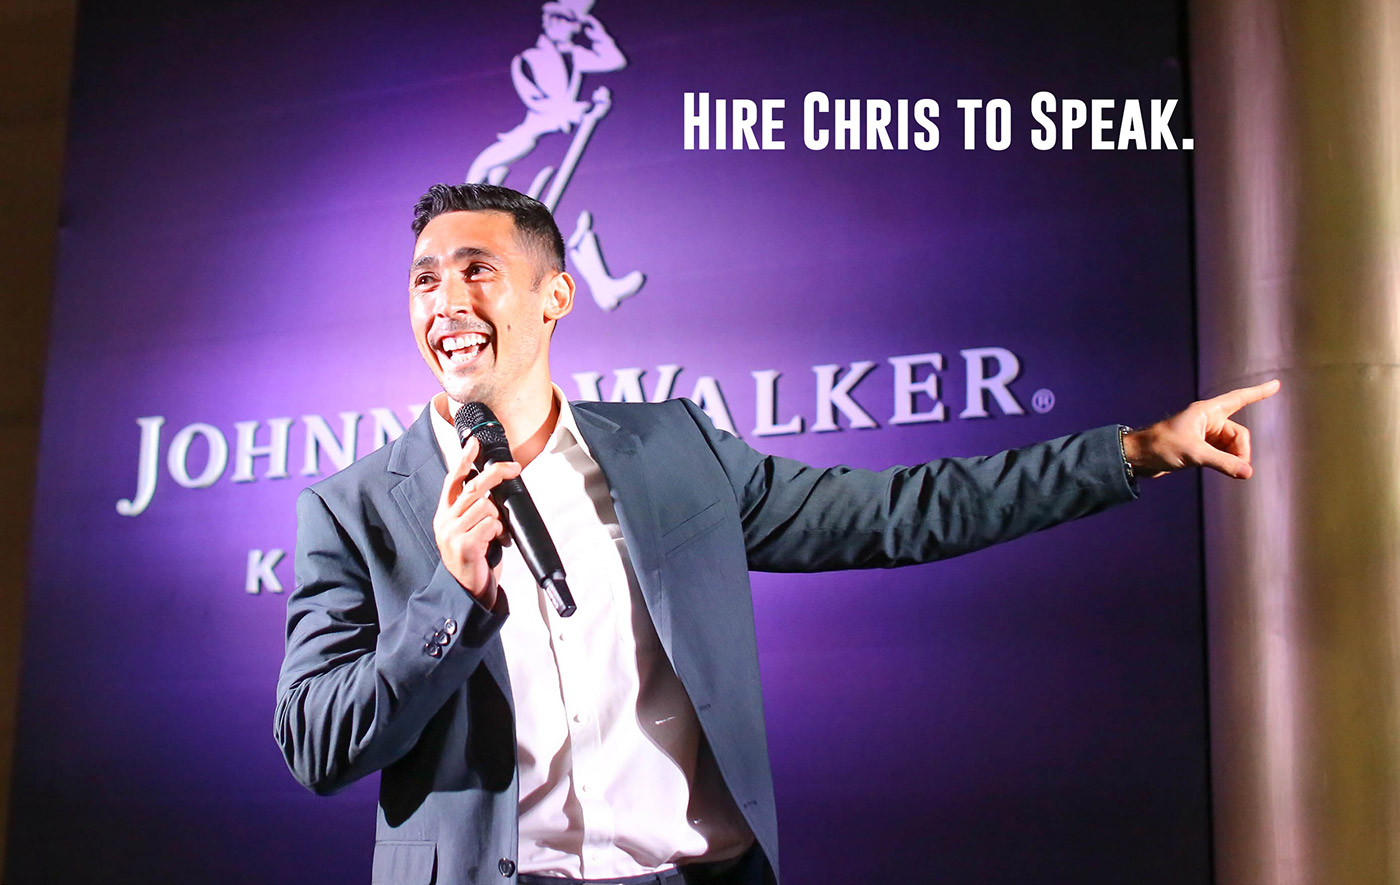 Chris as a keynote motivational speaker